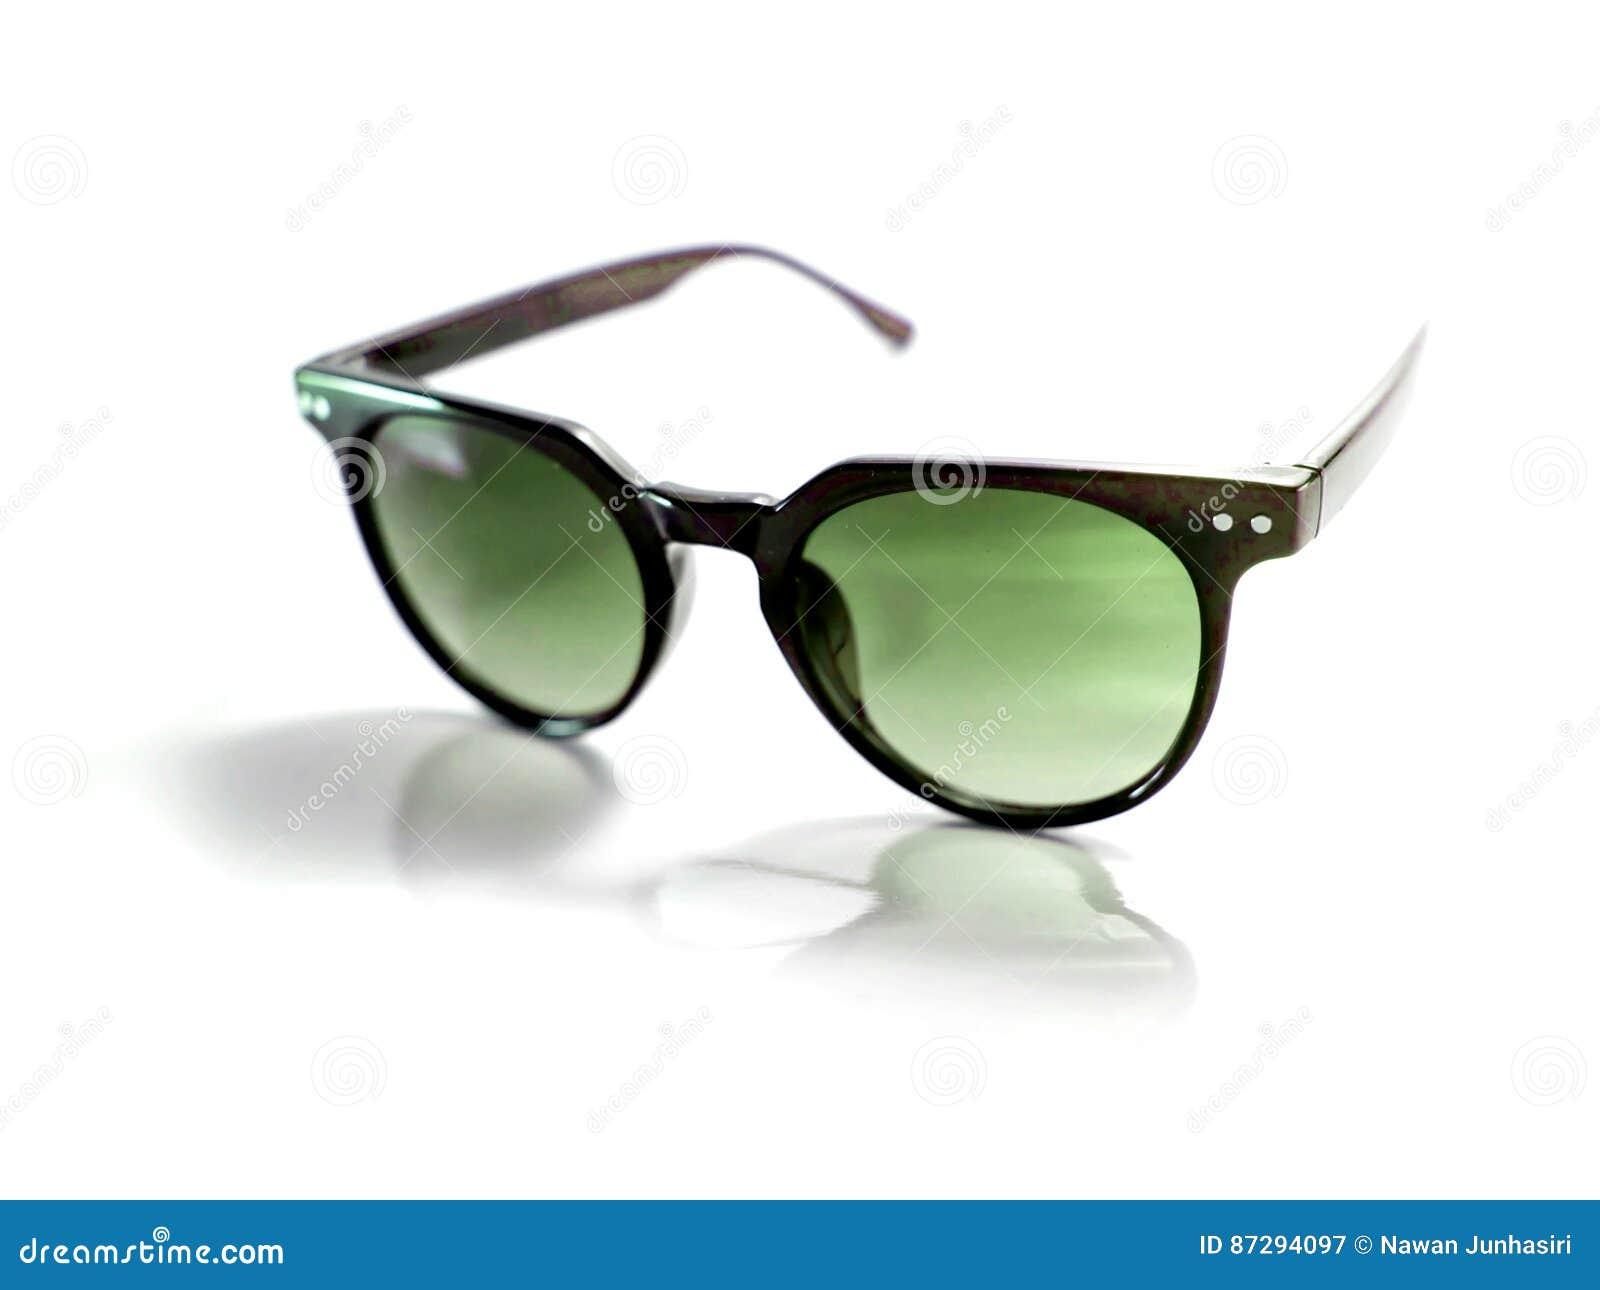 1610e464d9 Απομονωμένα μαύρα γυαλιά ηλίου με τον πράσινο φακό στο άσπρο υπόβαθρο